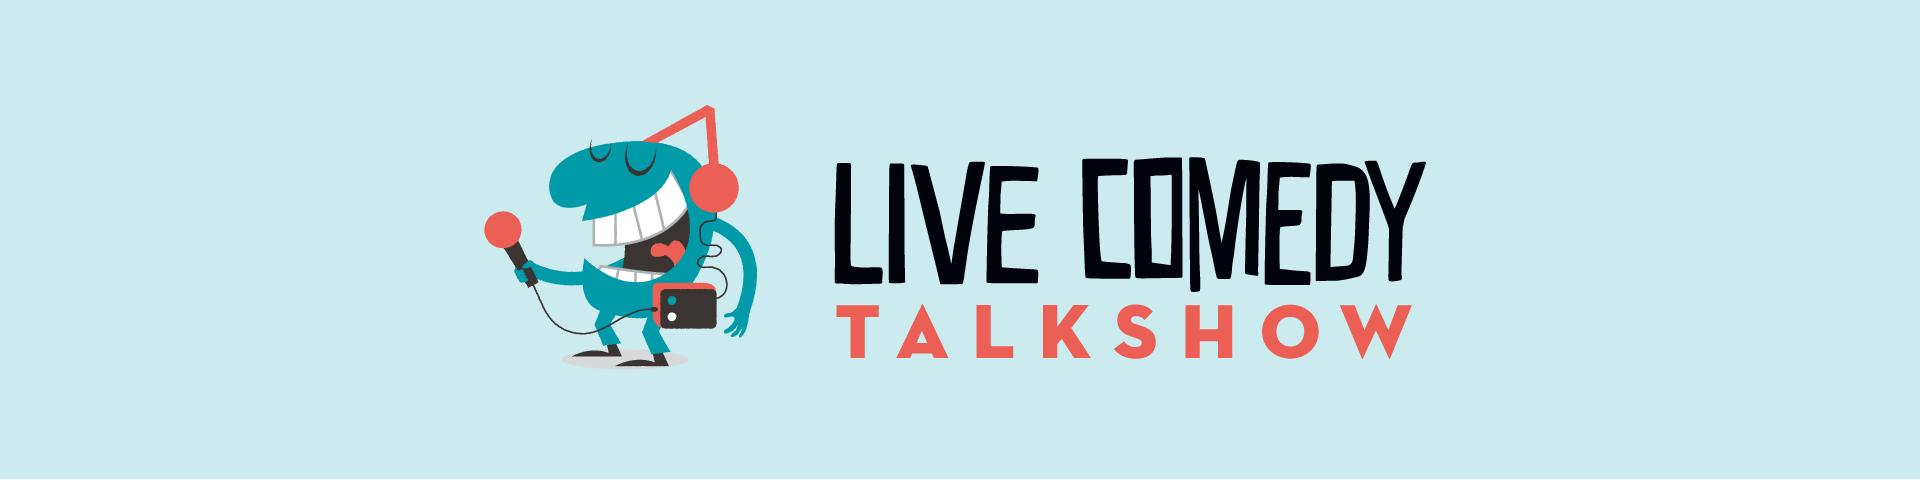 Live Comedy Talkshow